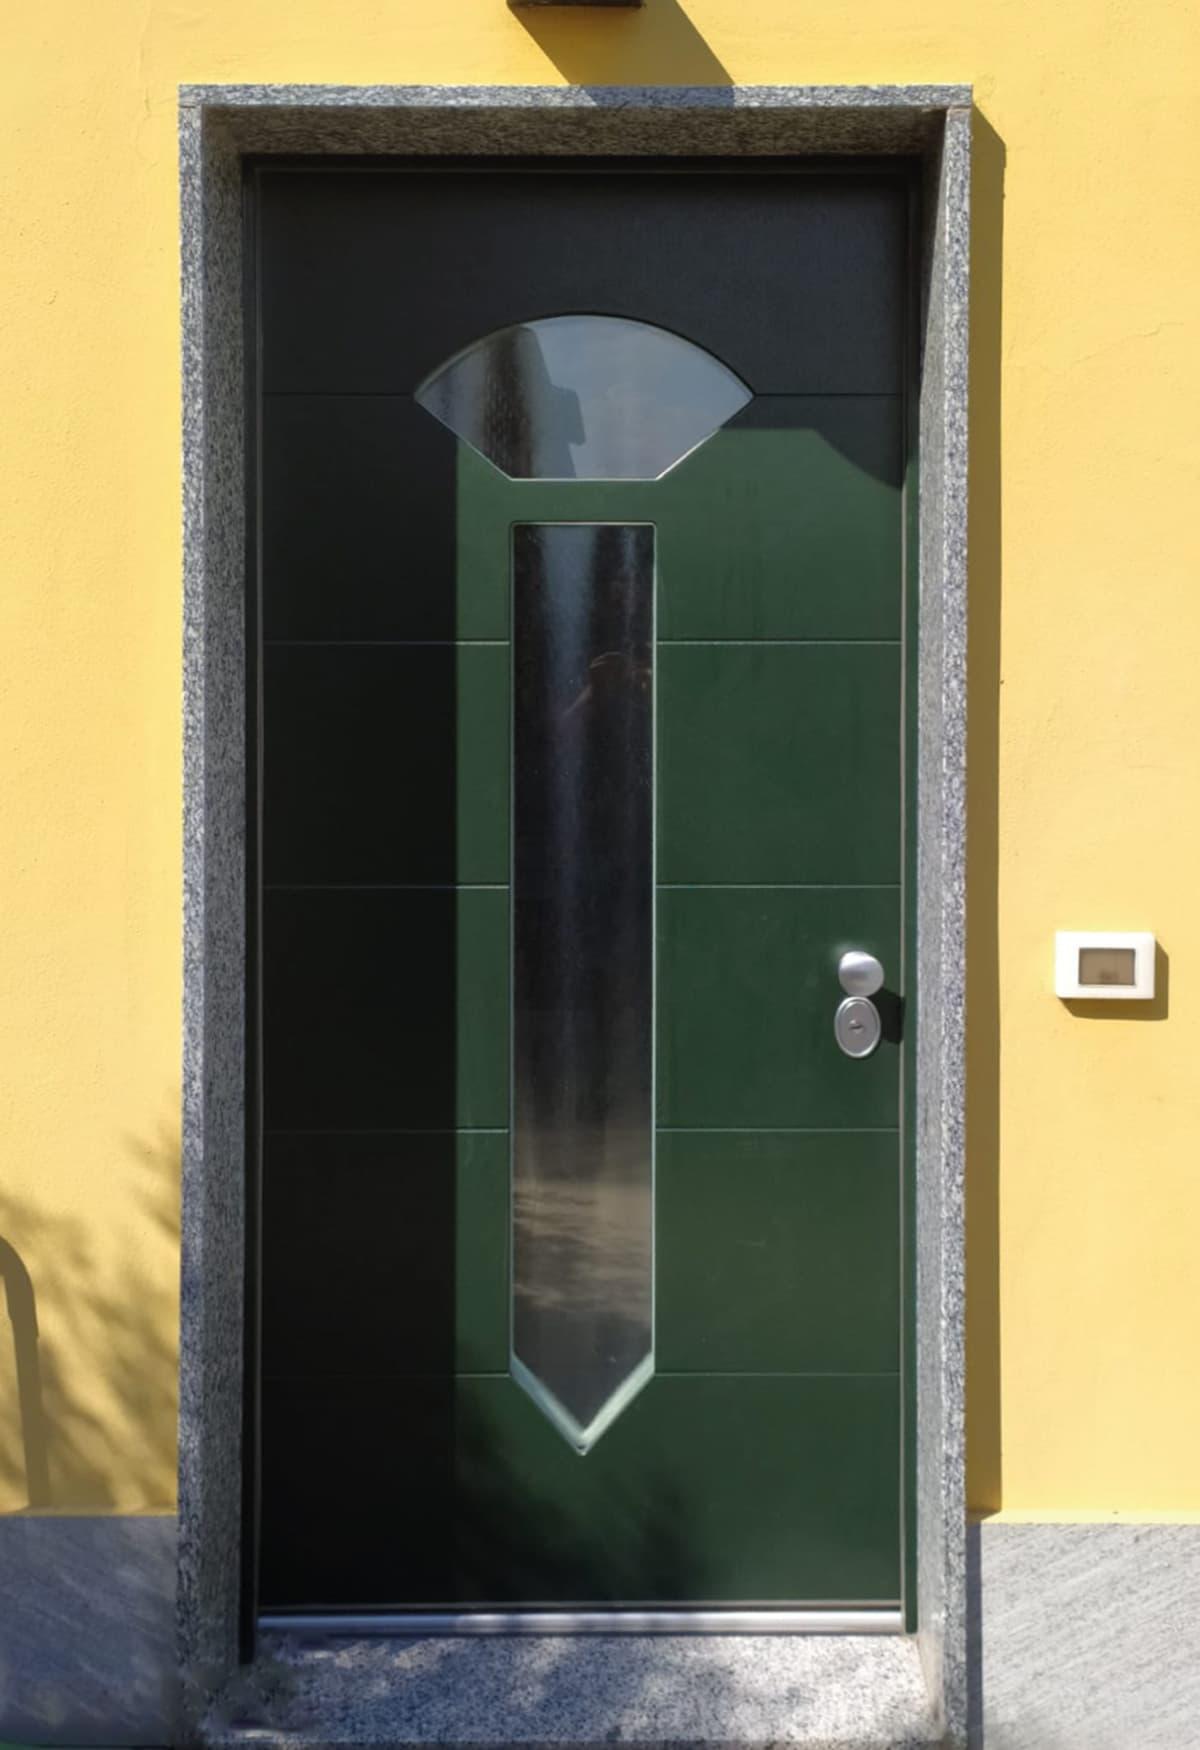 porta blindata con anta vetrata